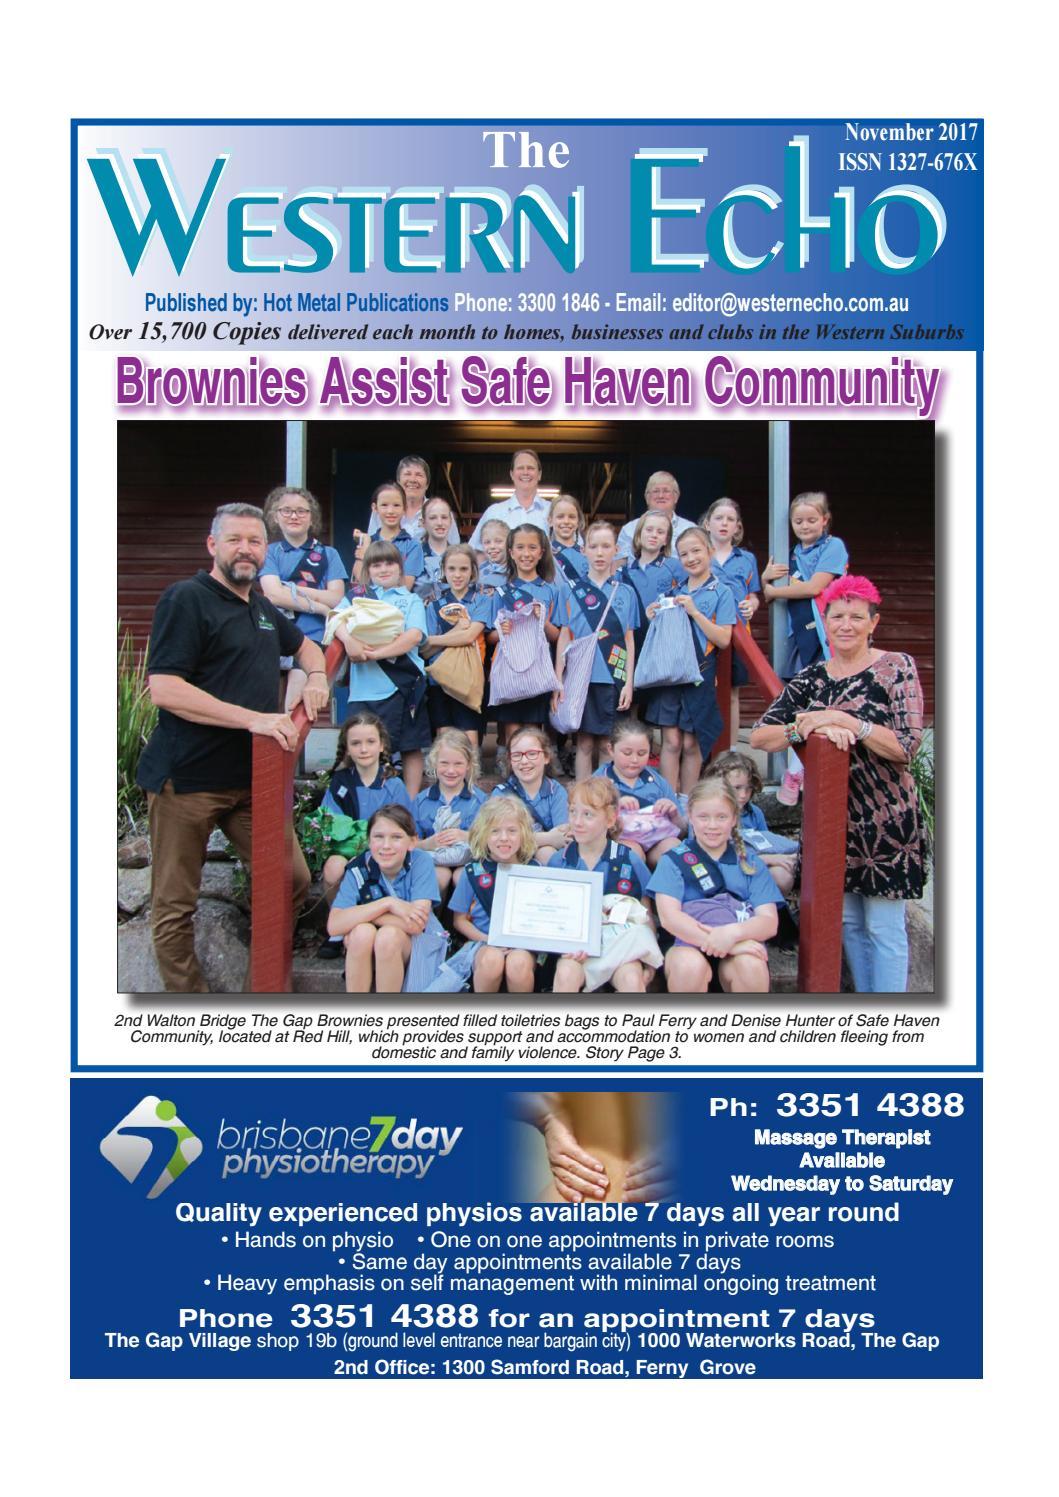 The western echo november 2017 by The Western Echo - issuu